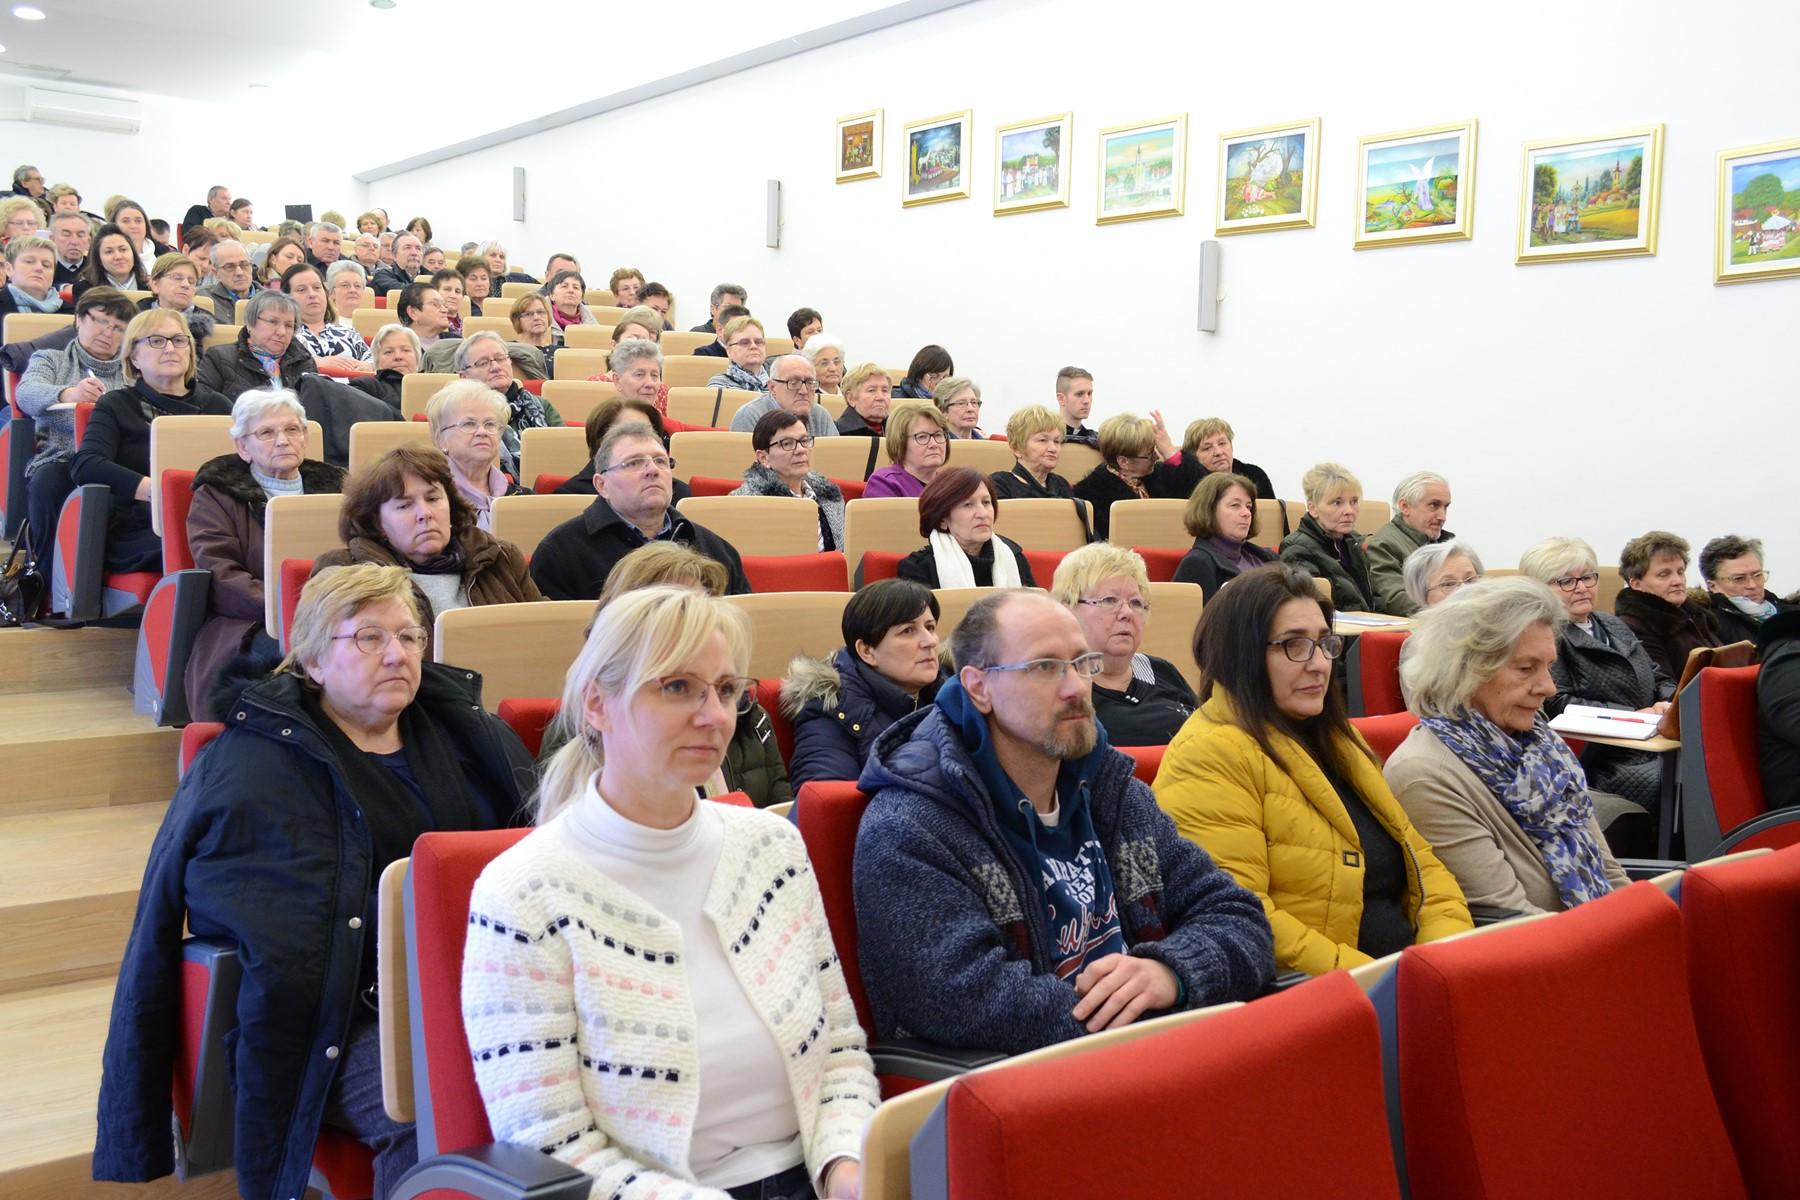 Susret voditelja i suradnika župnih caritasa s područja Varaždinske biskupije